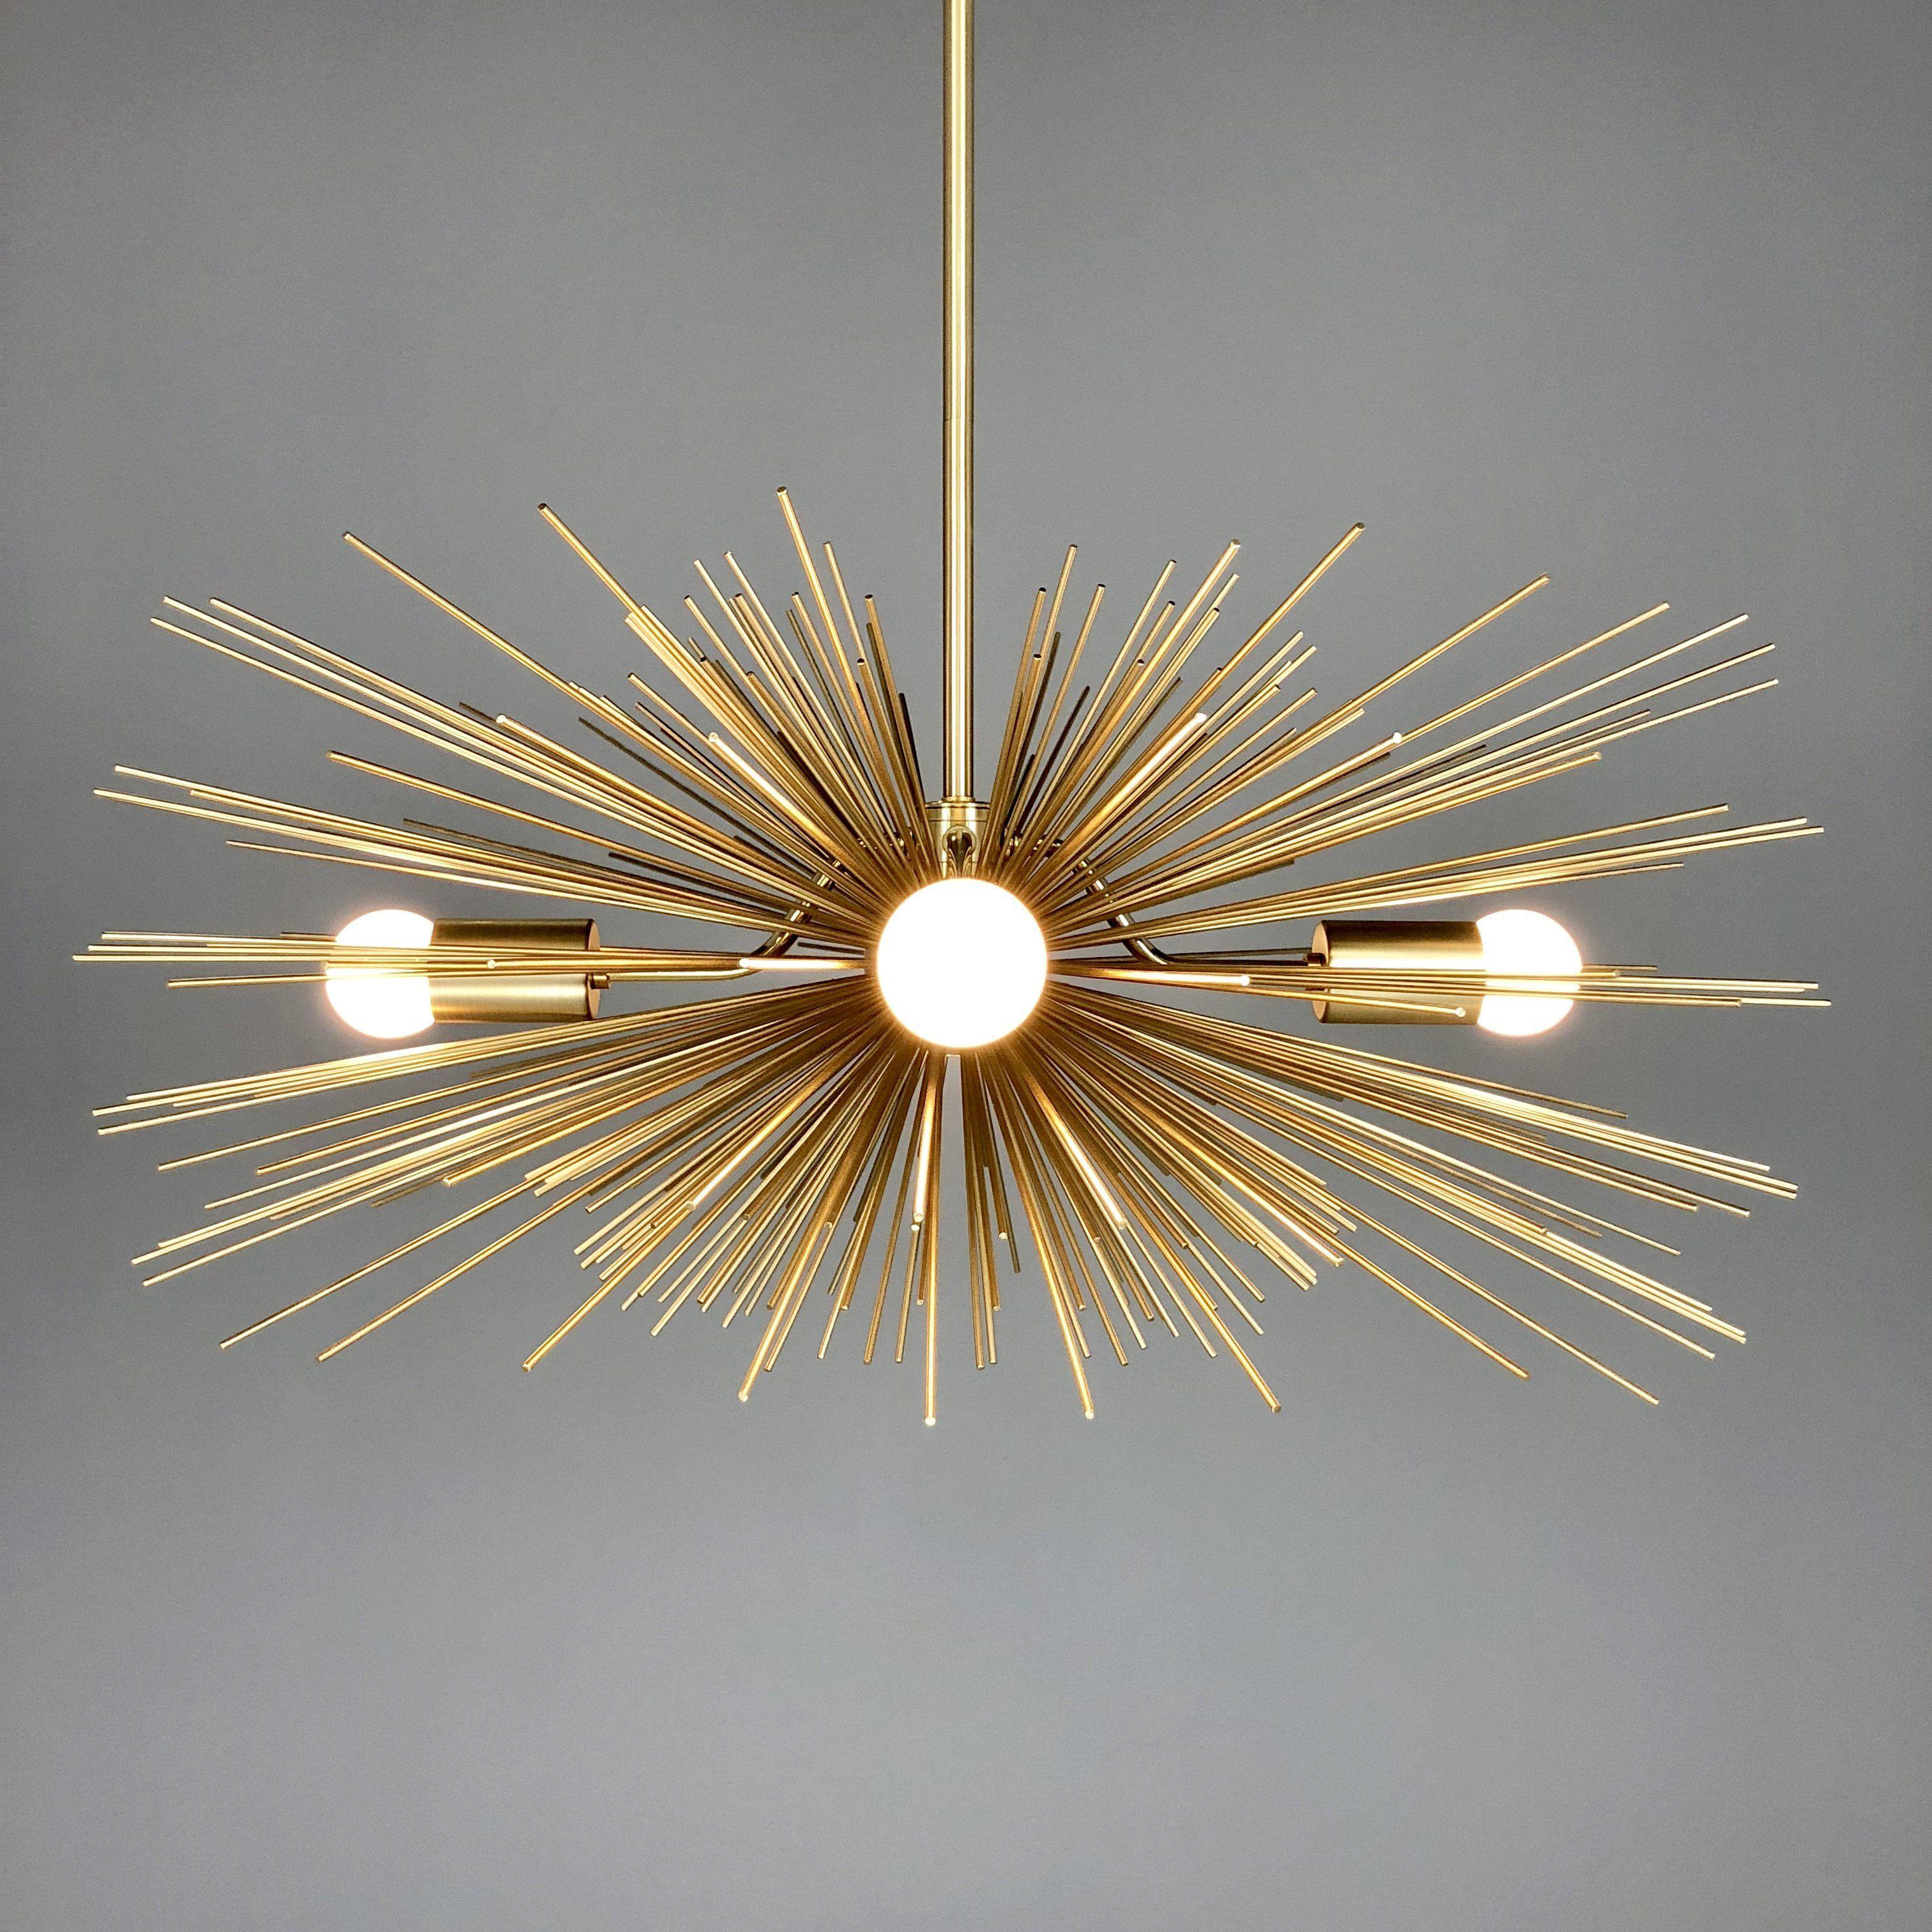 chandelier lighting torus sophie rubin format urchin